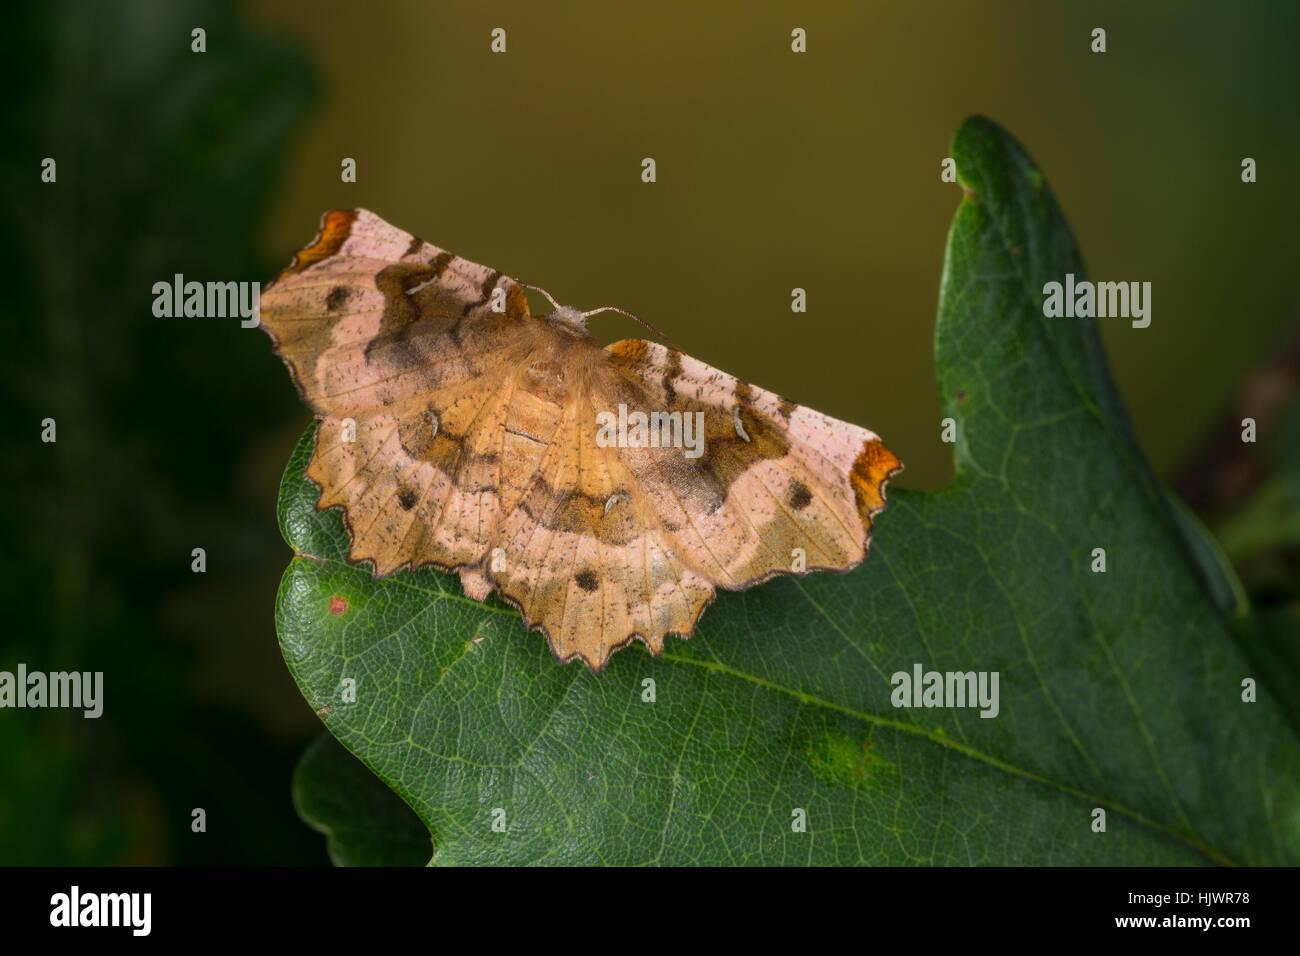 Violettbrauner Mondfleckspanner, Selenia tetralunaria, purple thorn, l'ennomos illustre. Spanner, Geometridae, looper, - Stock Image